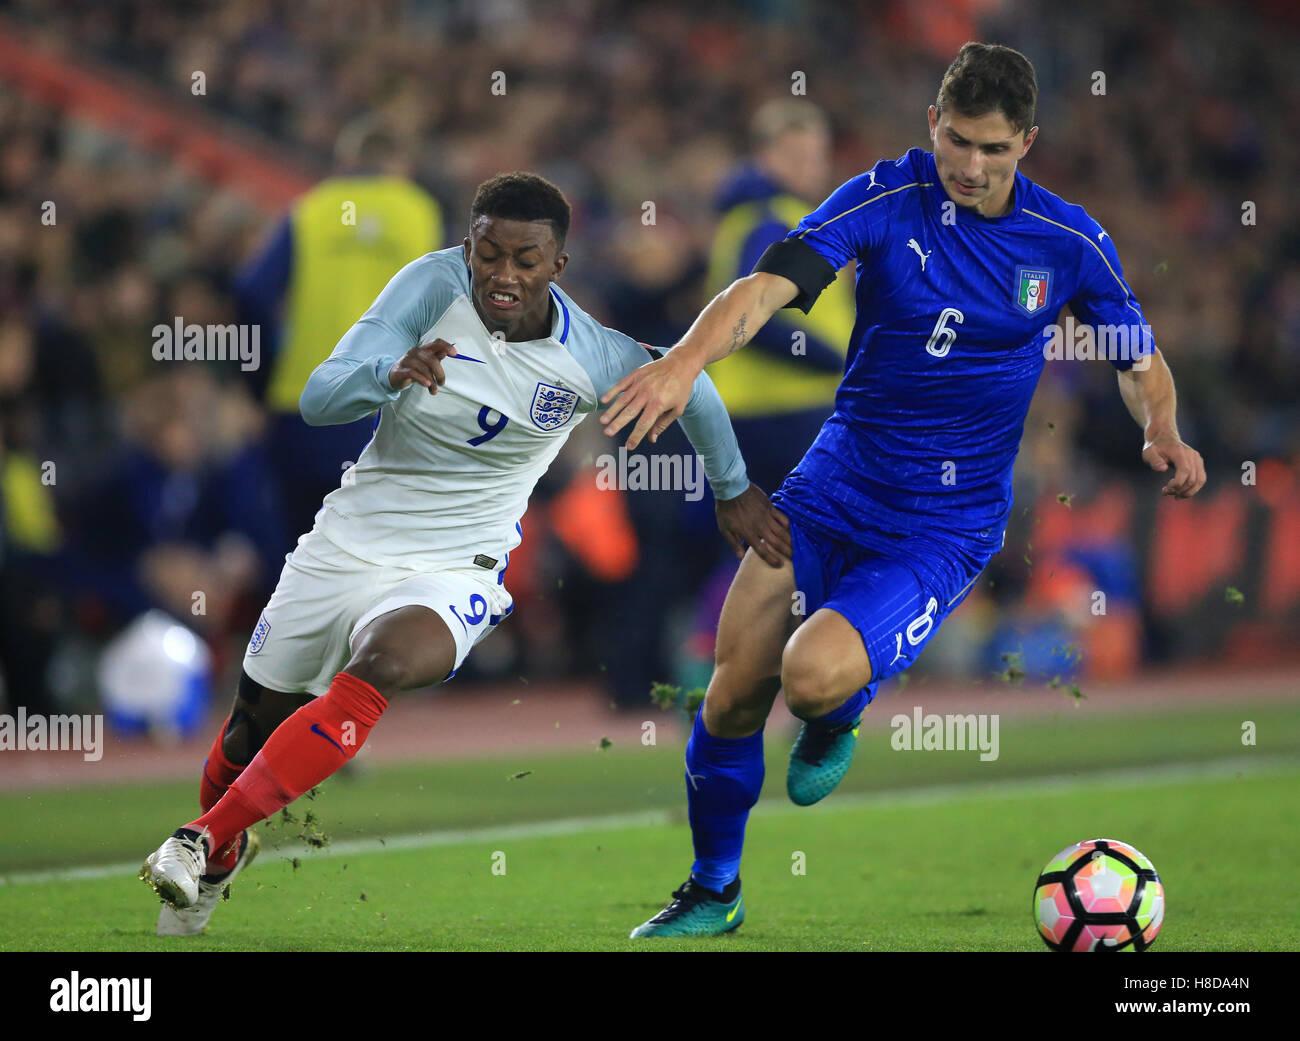 England U21's Demarai Gray (left) and Italy U21's Mattia Caldara battle for the ball during the International - Stock Image